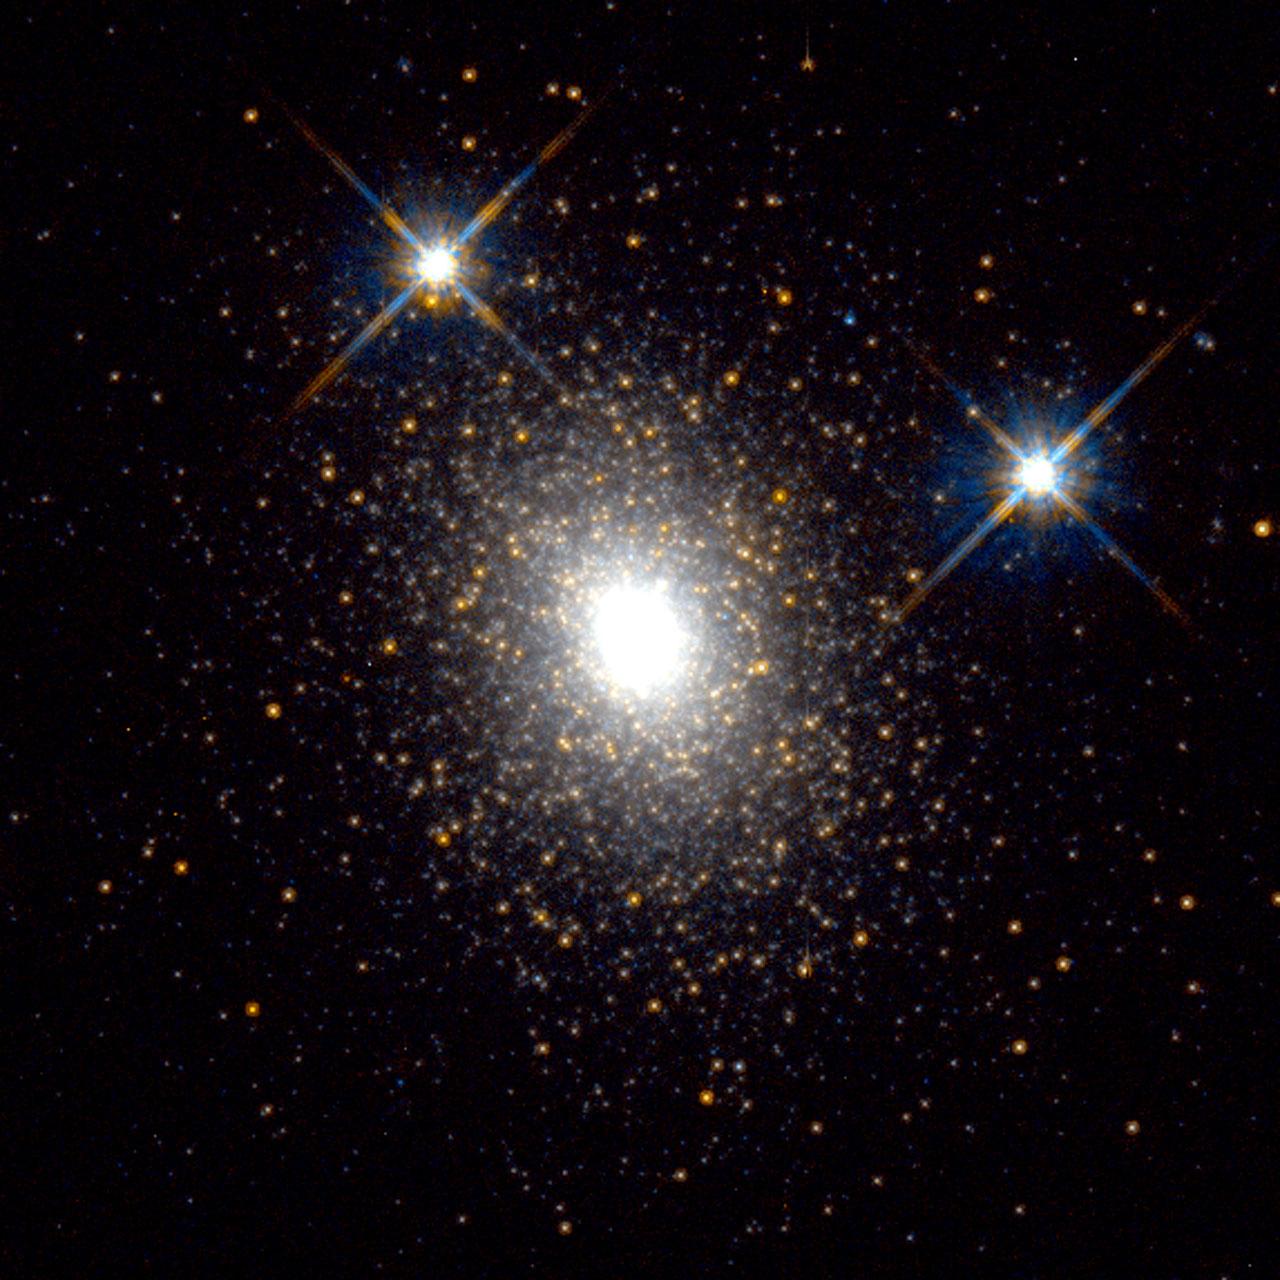 Globular Cluster in the Andromeda Galaxy | ESA/Hubble